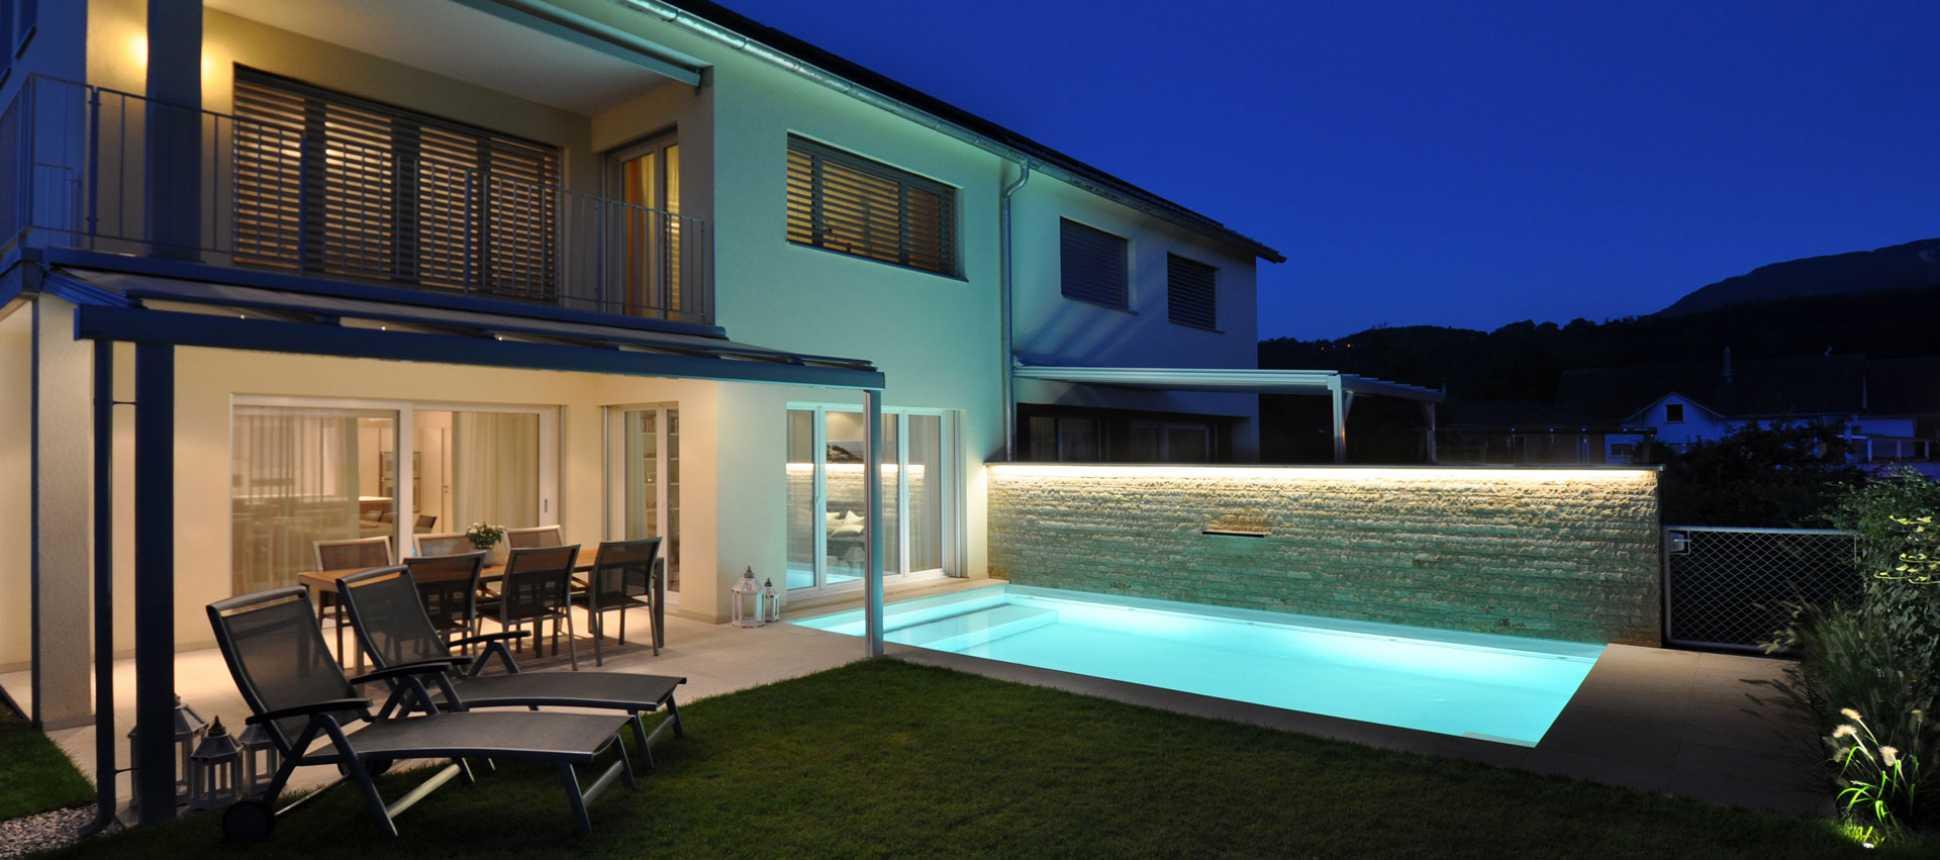 Haus mit Swimmingpool beleuchtet